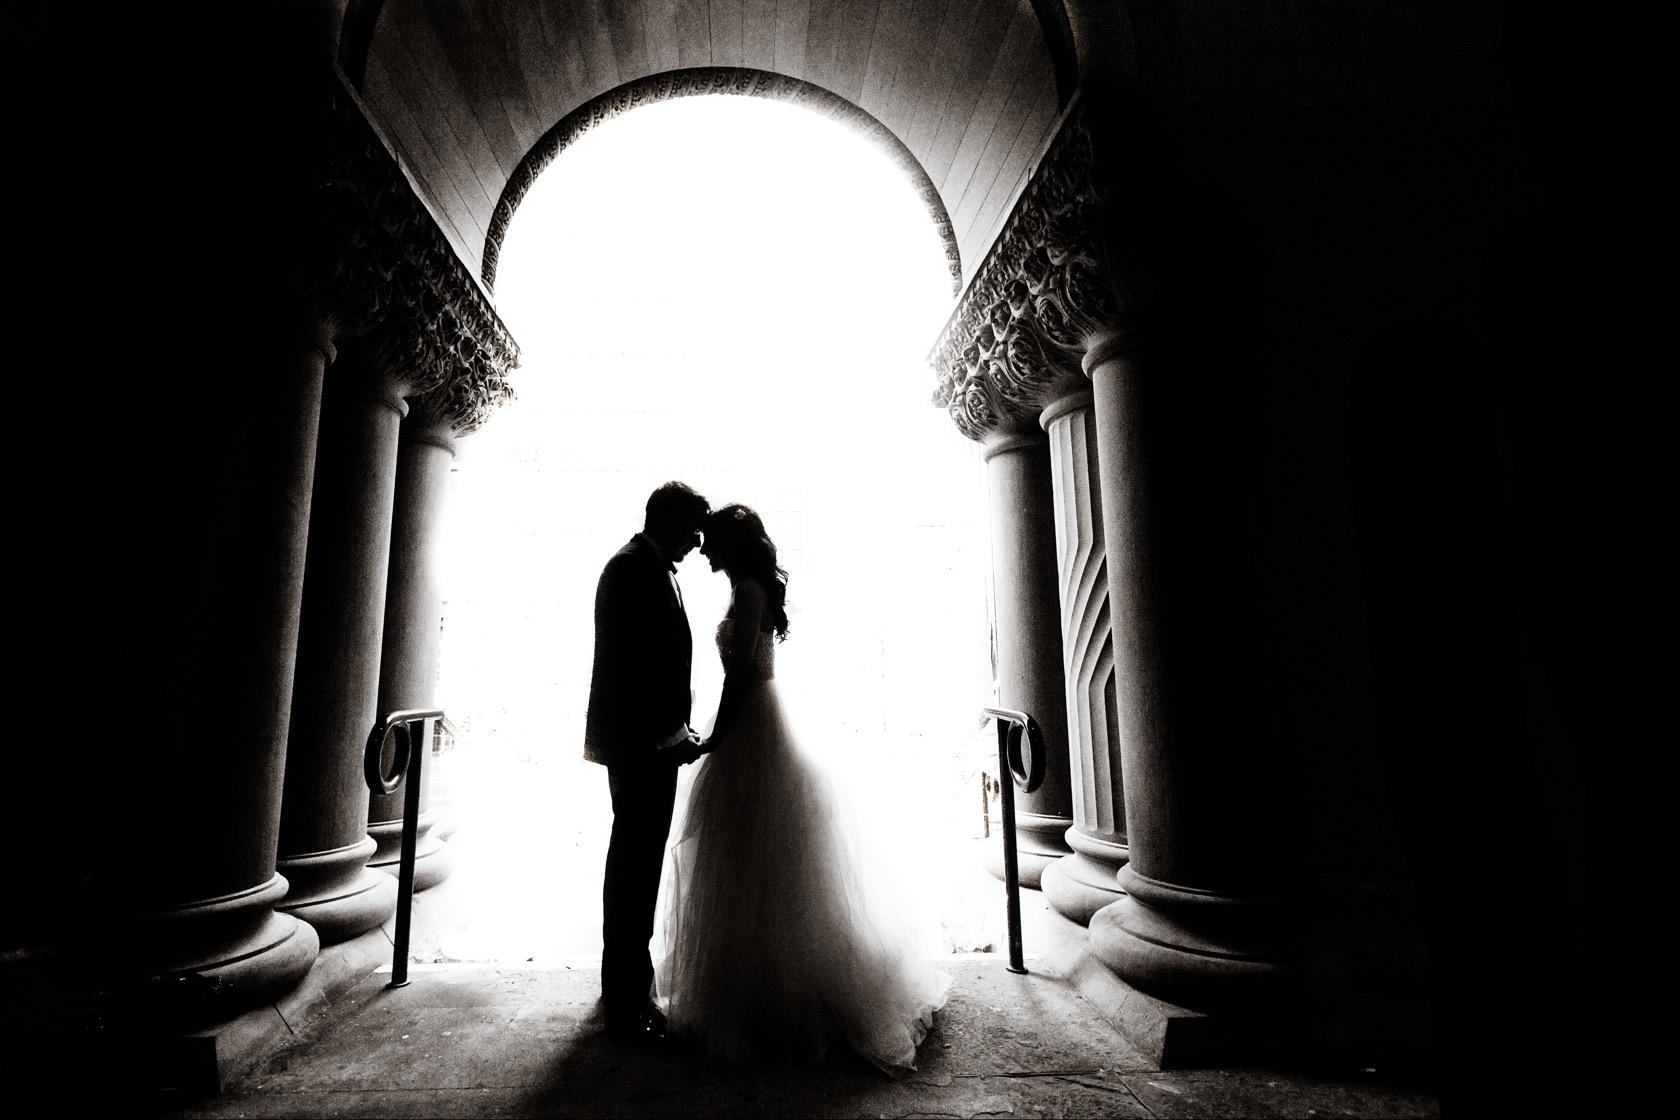 stephen sager photography 2243 toronto wedding photography